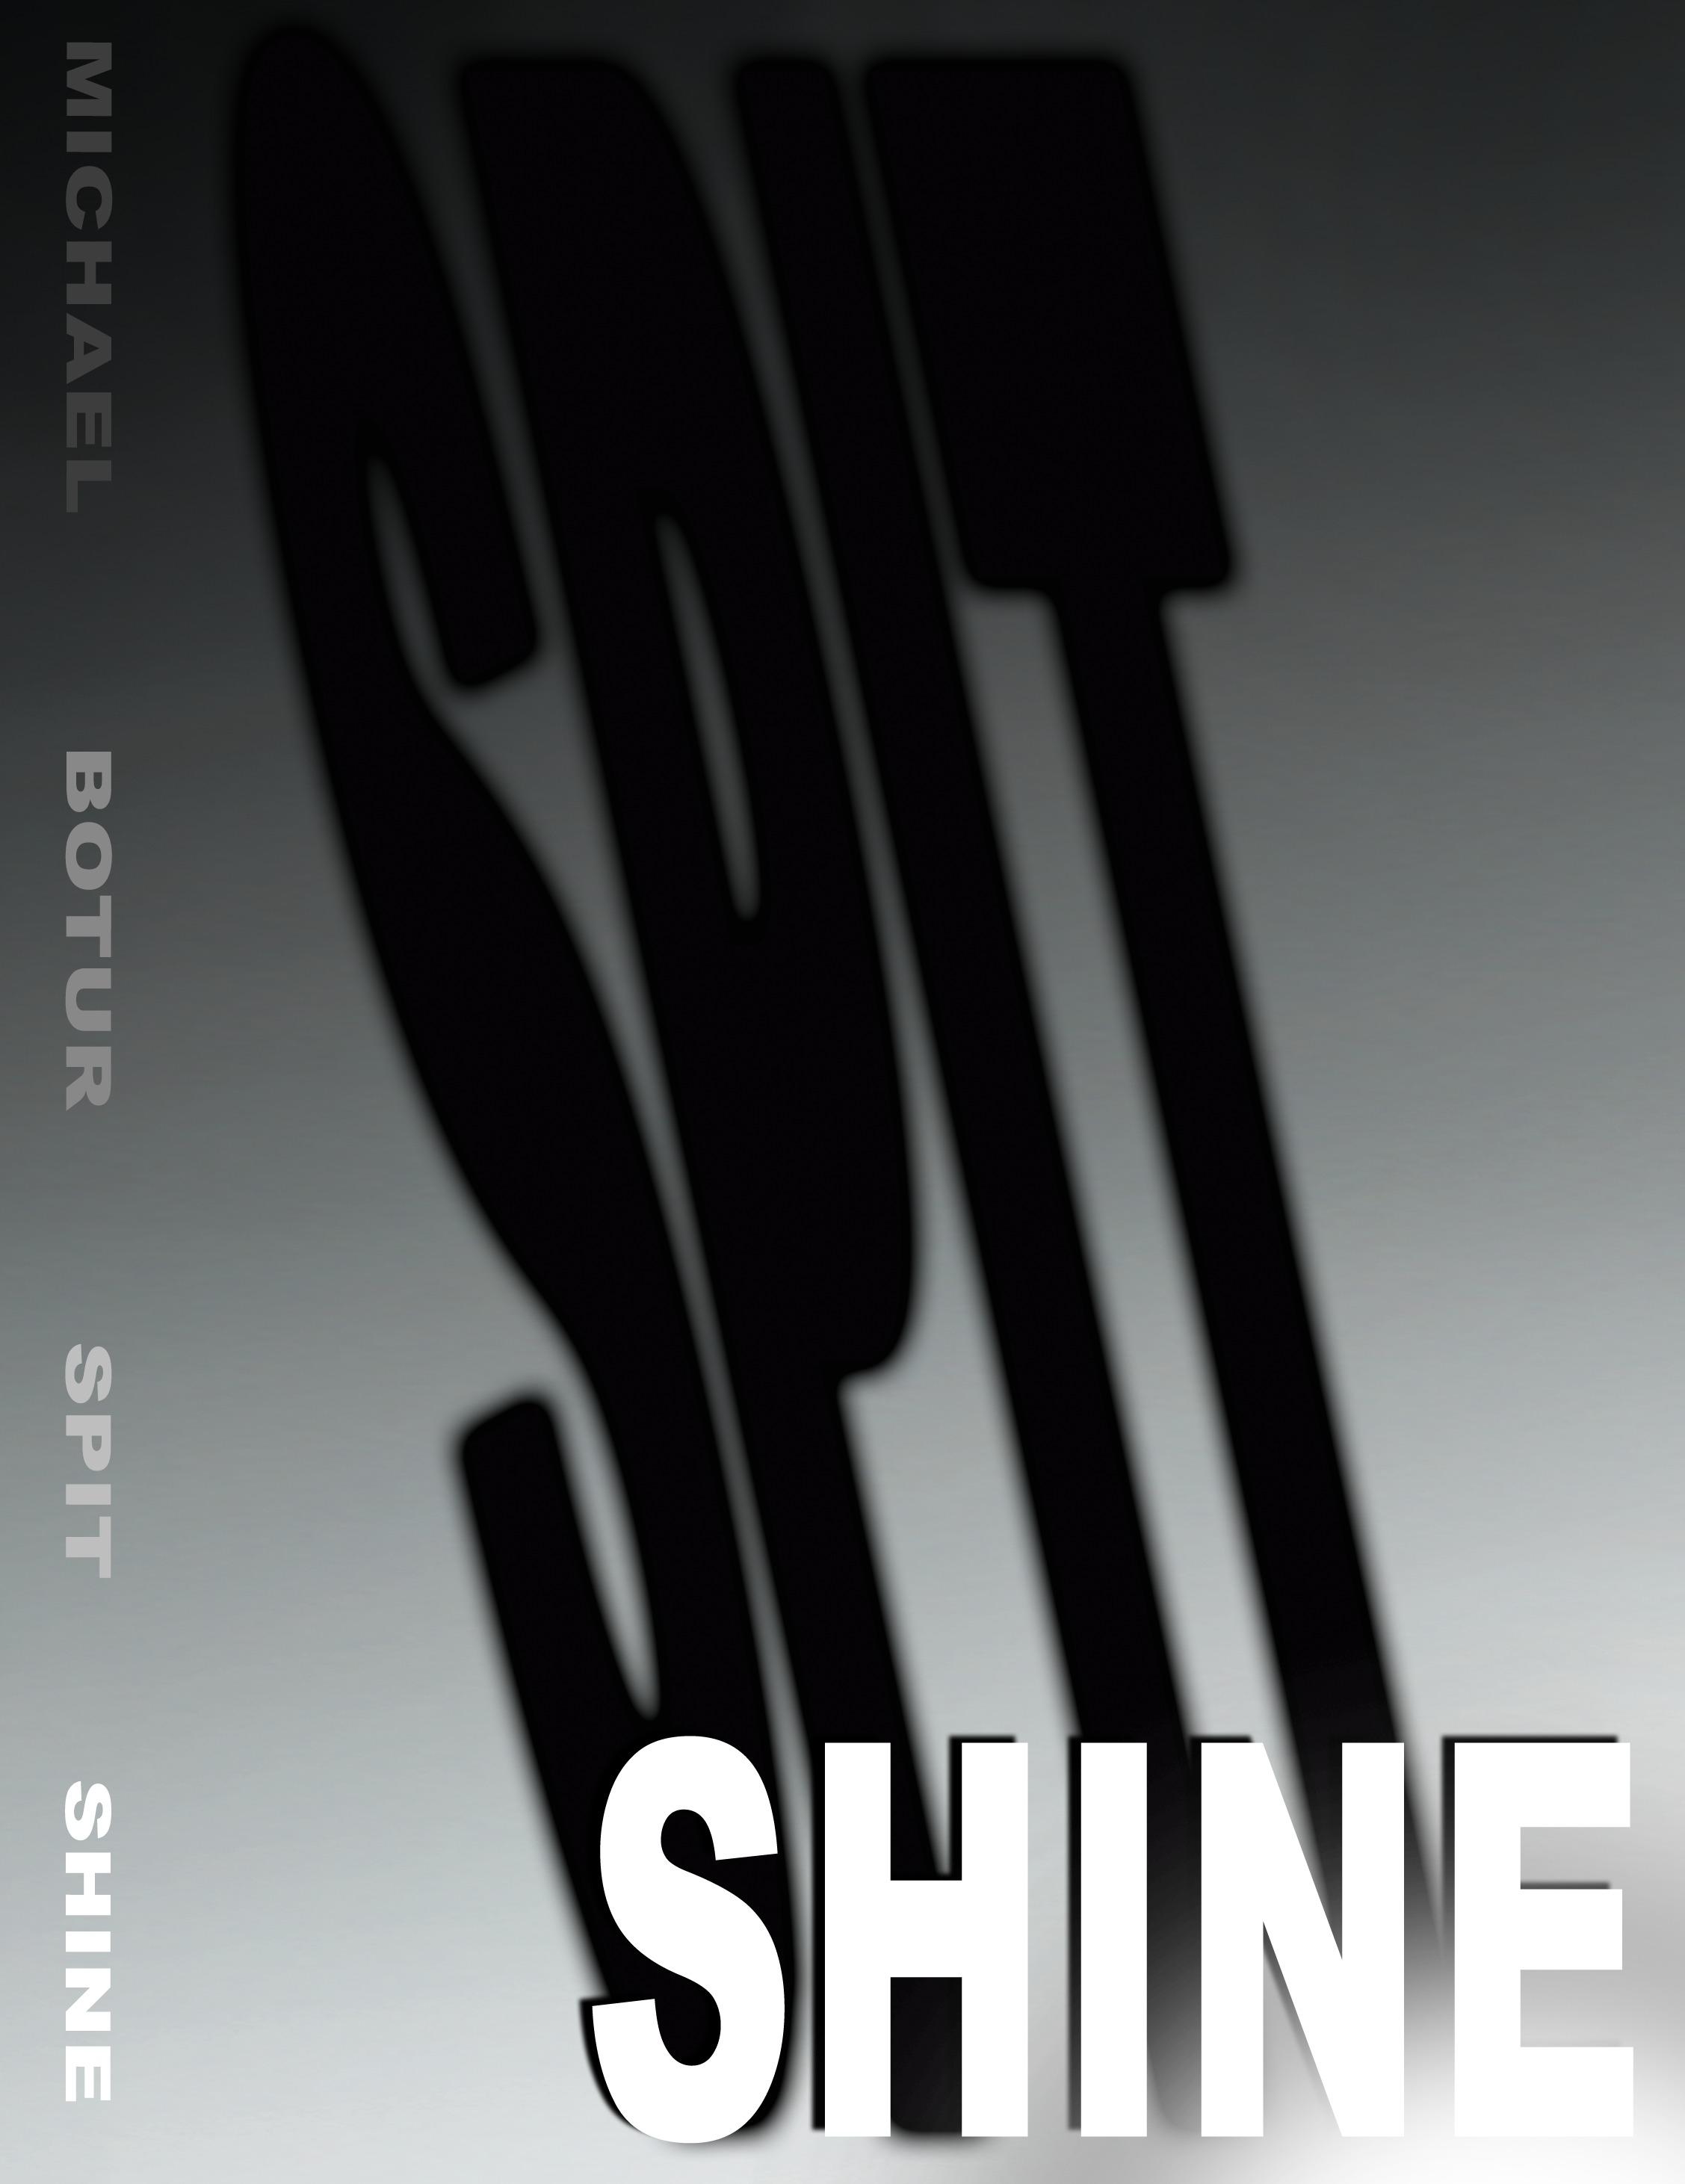 Spitshine  by  Michael Botur